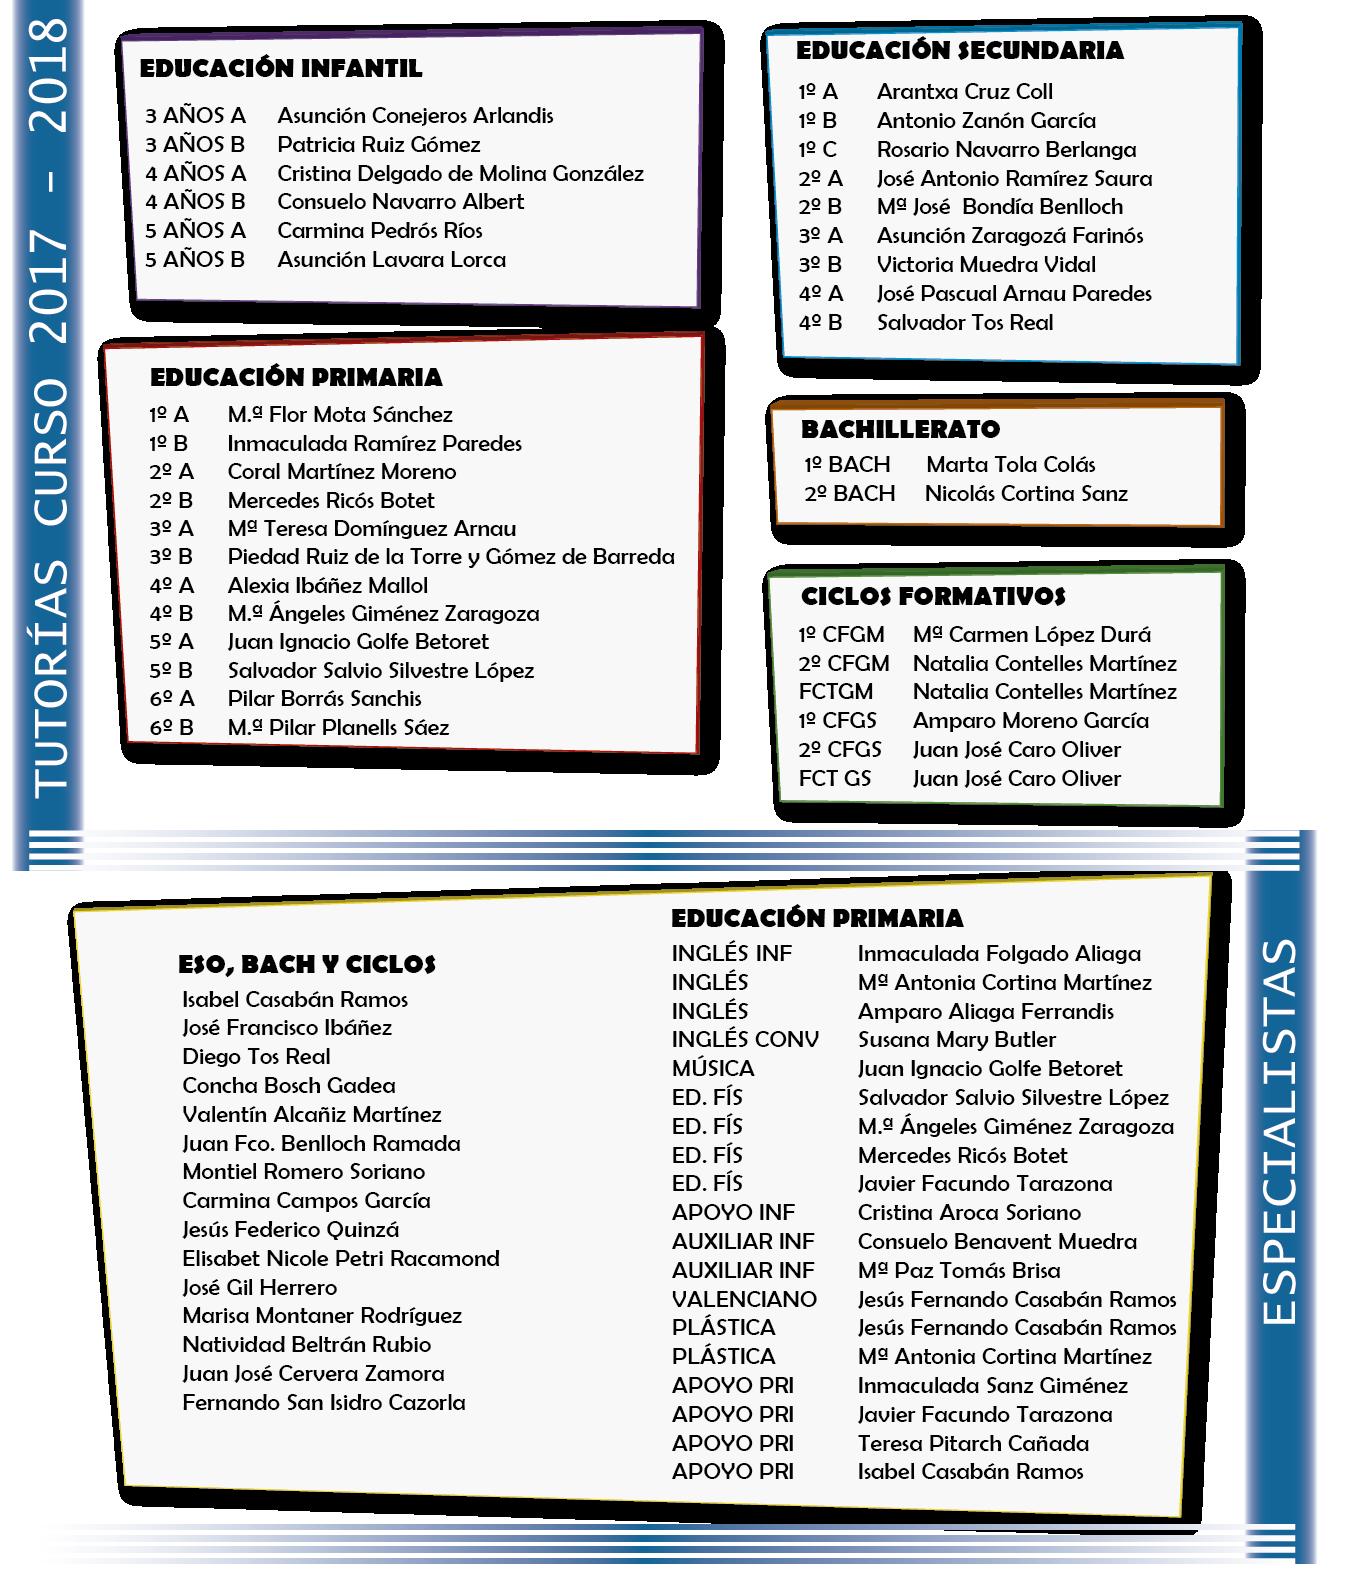 PROFESORADO2015-2-01